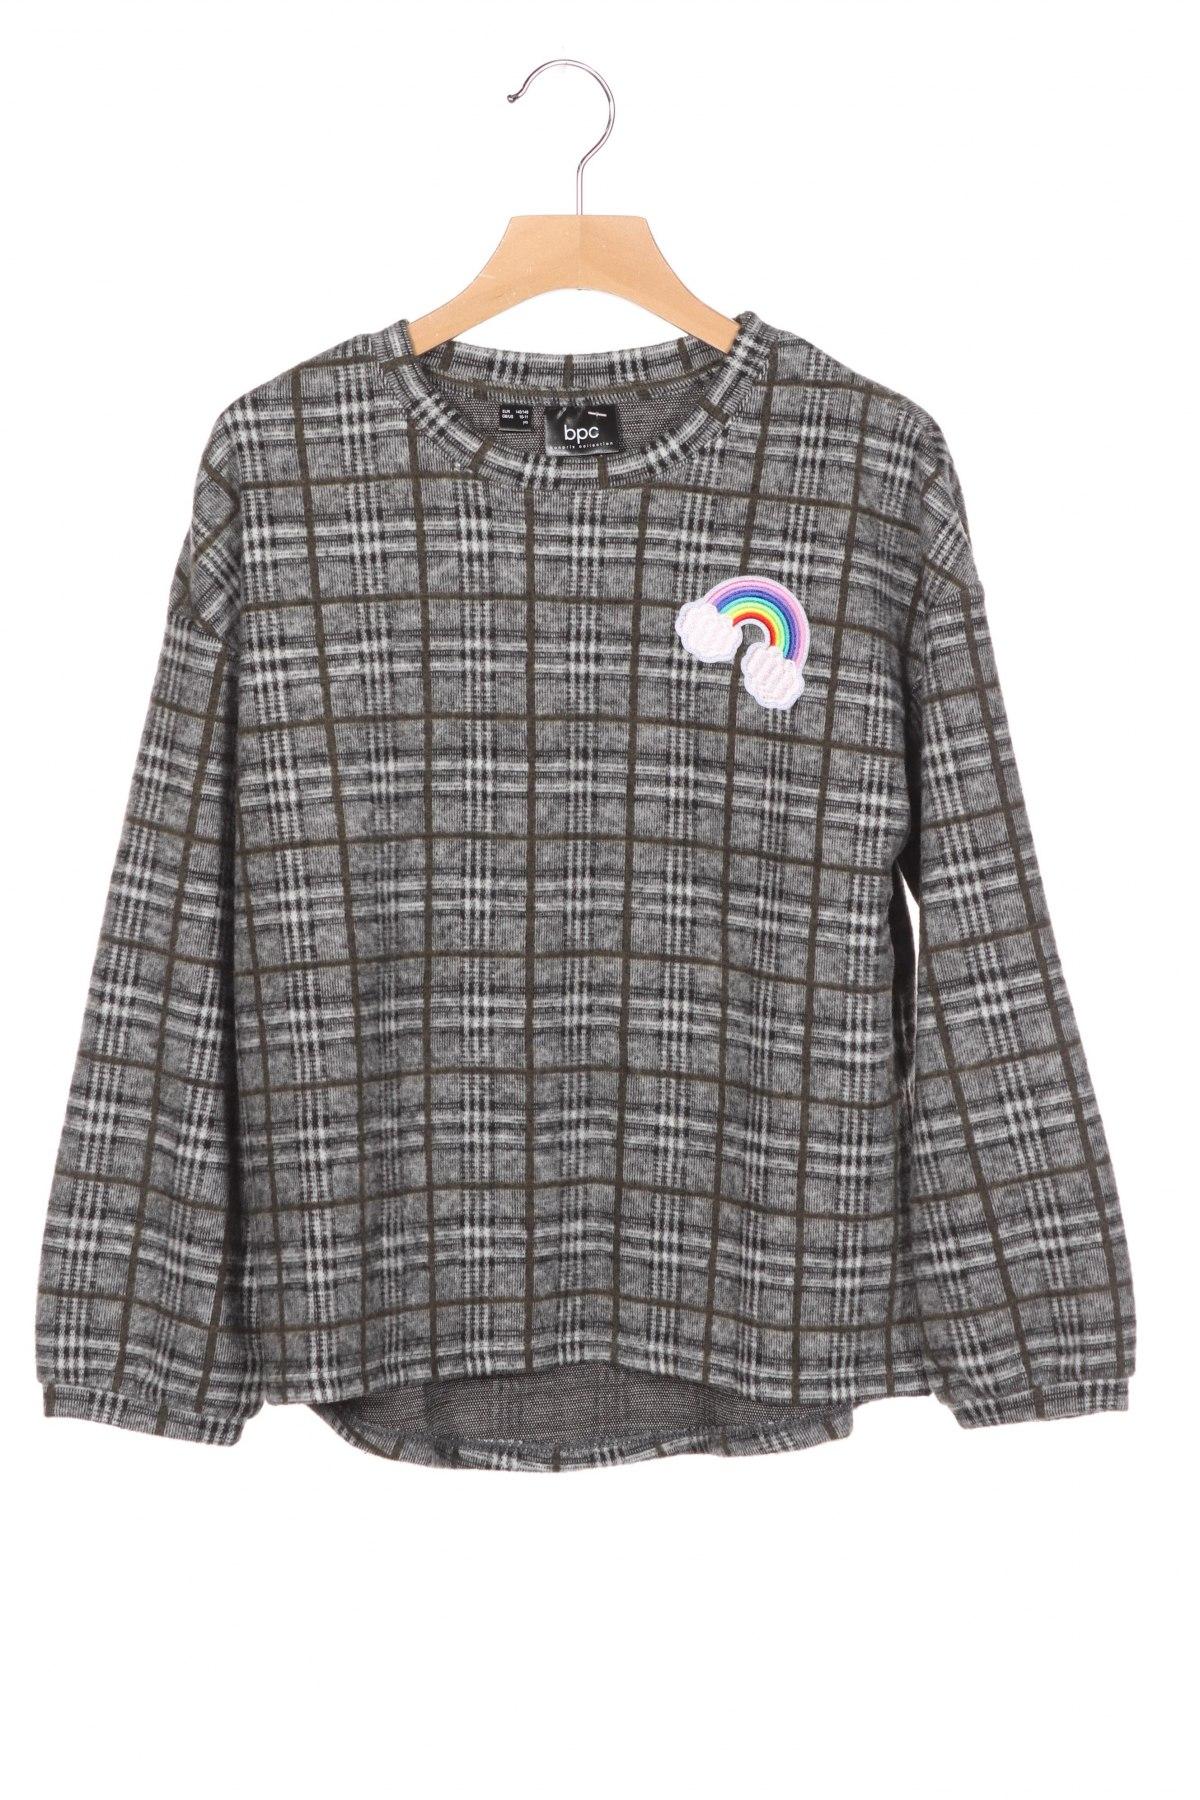 Детска блуза Bpc Bonprix Collection, Размер 9-10y/ 140-146 см, Цвят Сив, 89% полиестер, 10% вискоза, 1% еластан, Цена 25,50лв.